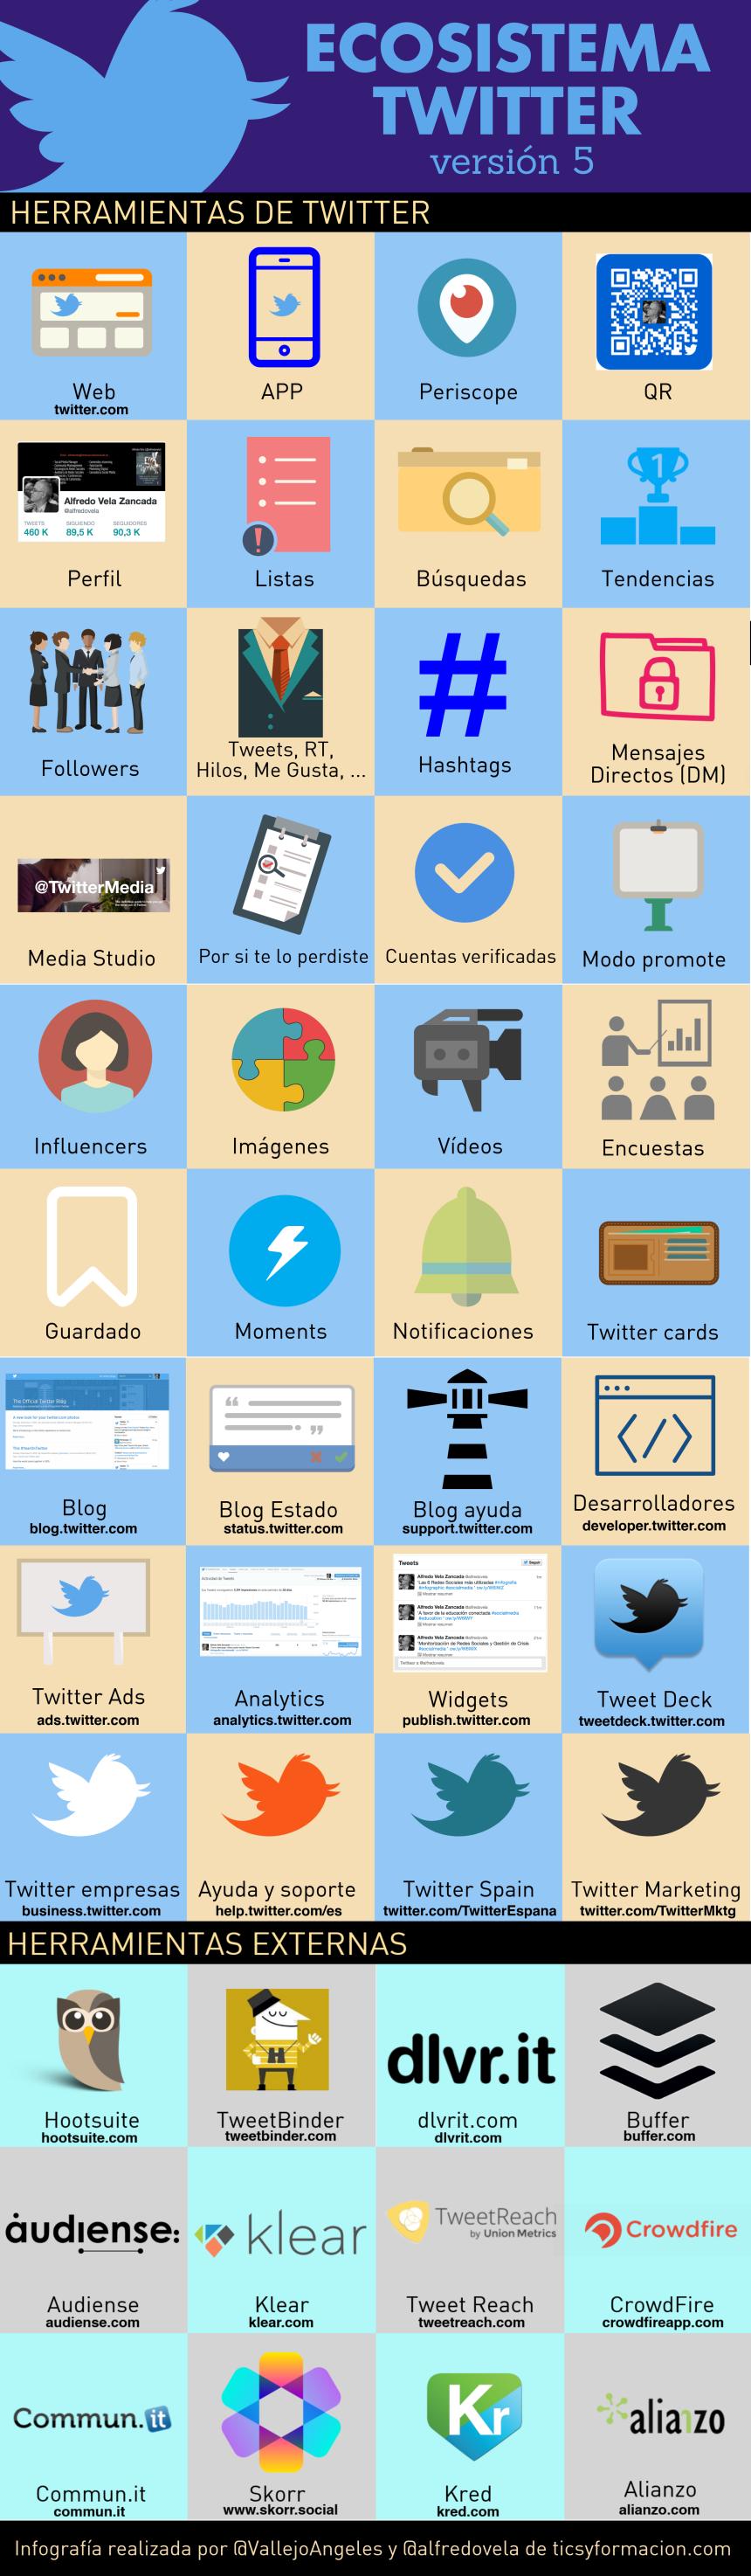 Ecosistema Twitter (versión 5) #infografia #infographic #socialmedia